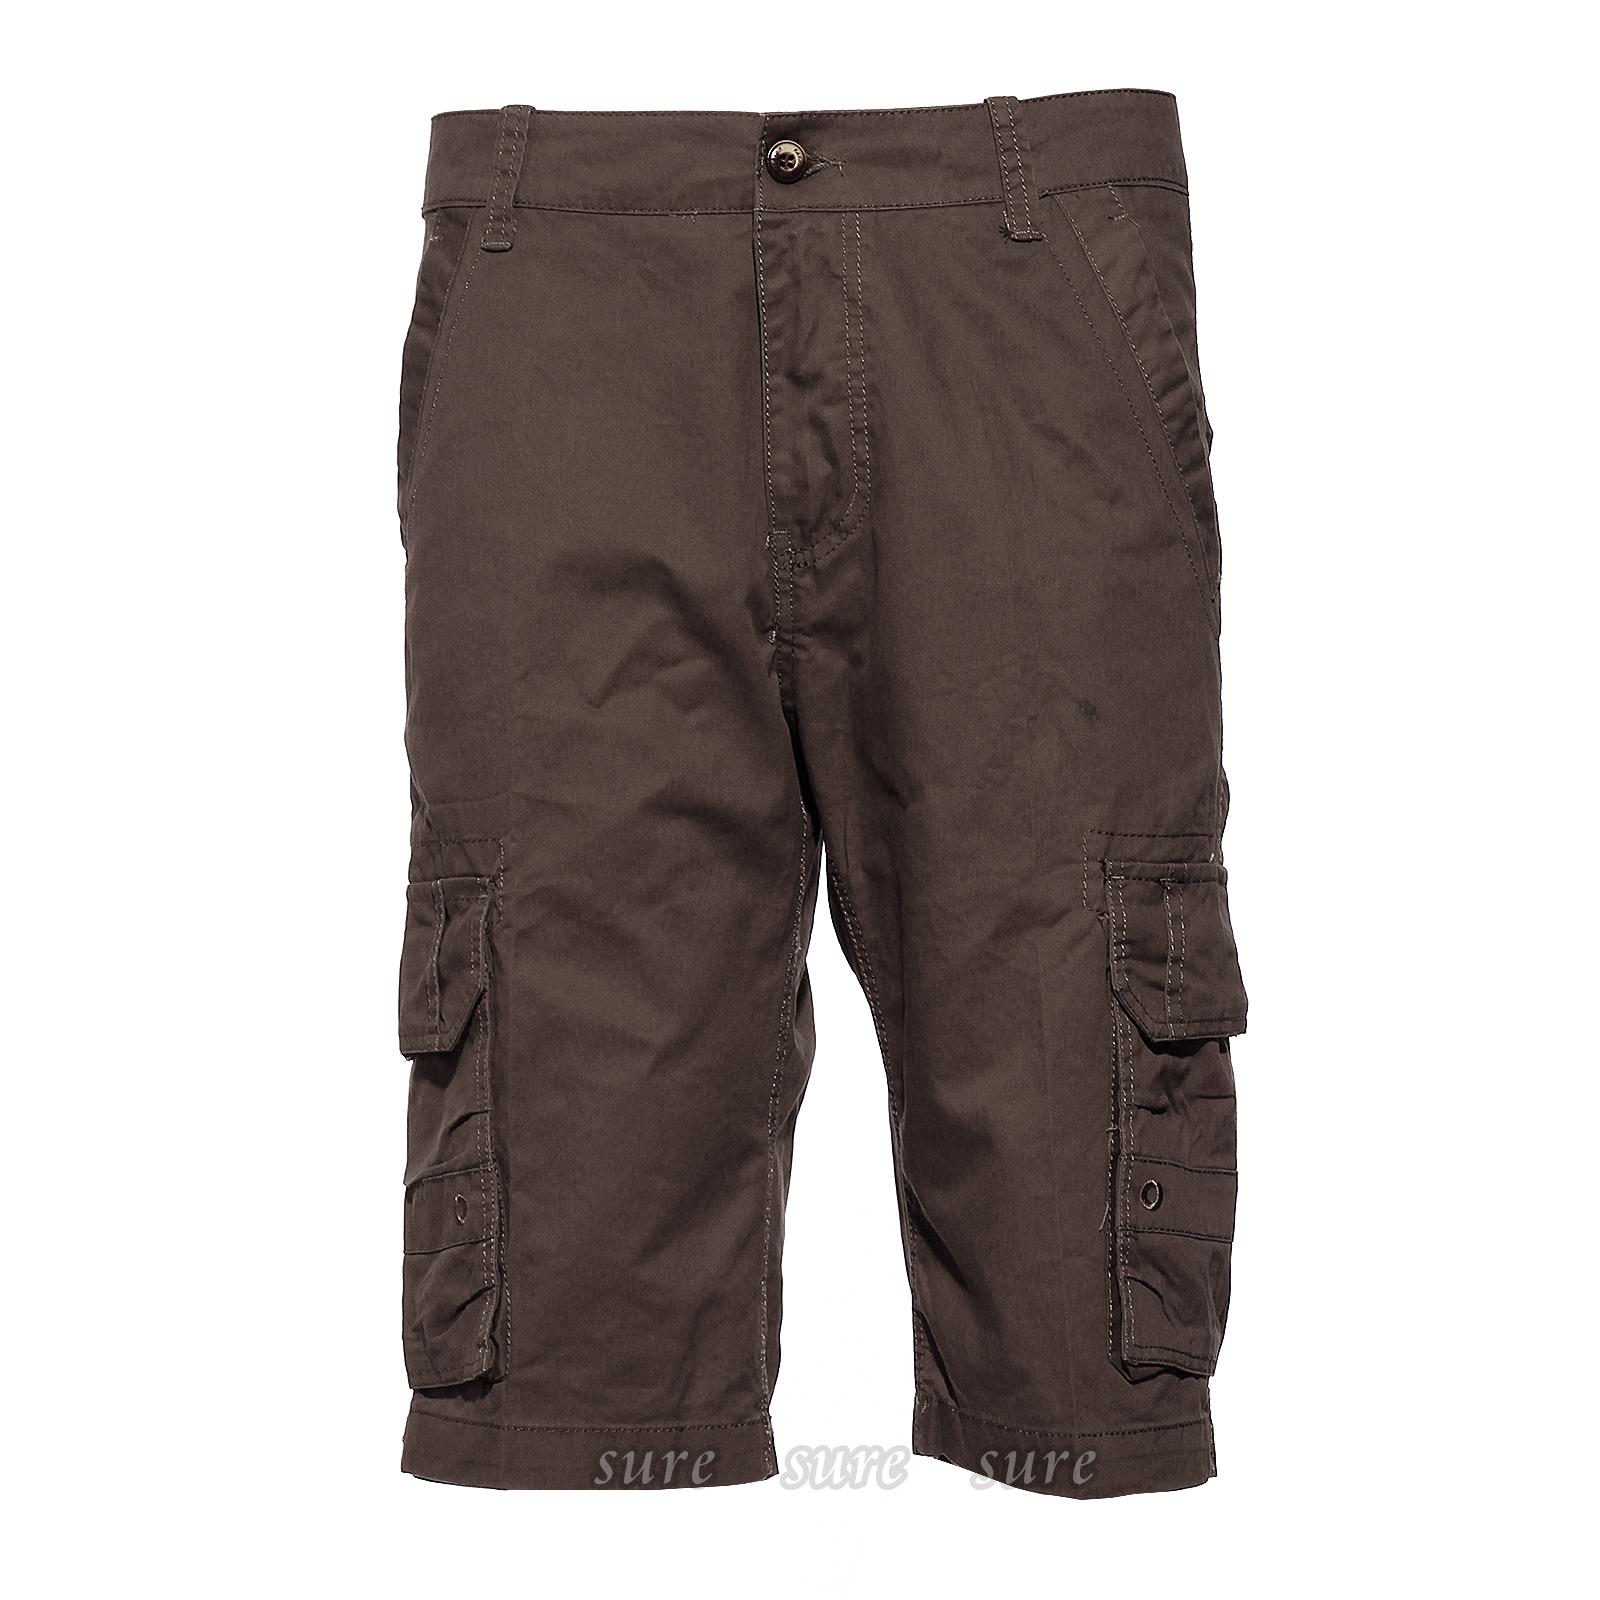 pantacourt cargo bermuda pantalon short homme sport 36 38 40 3couleur style 2 ebay. Black Bedroom Furniture Sets. Home Design Ideas